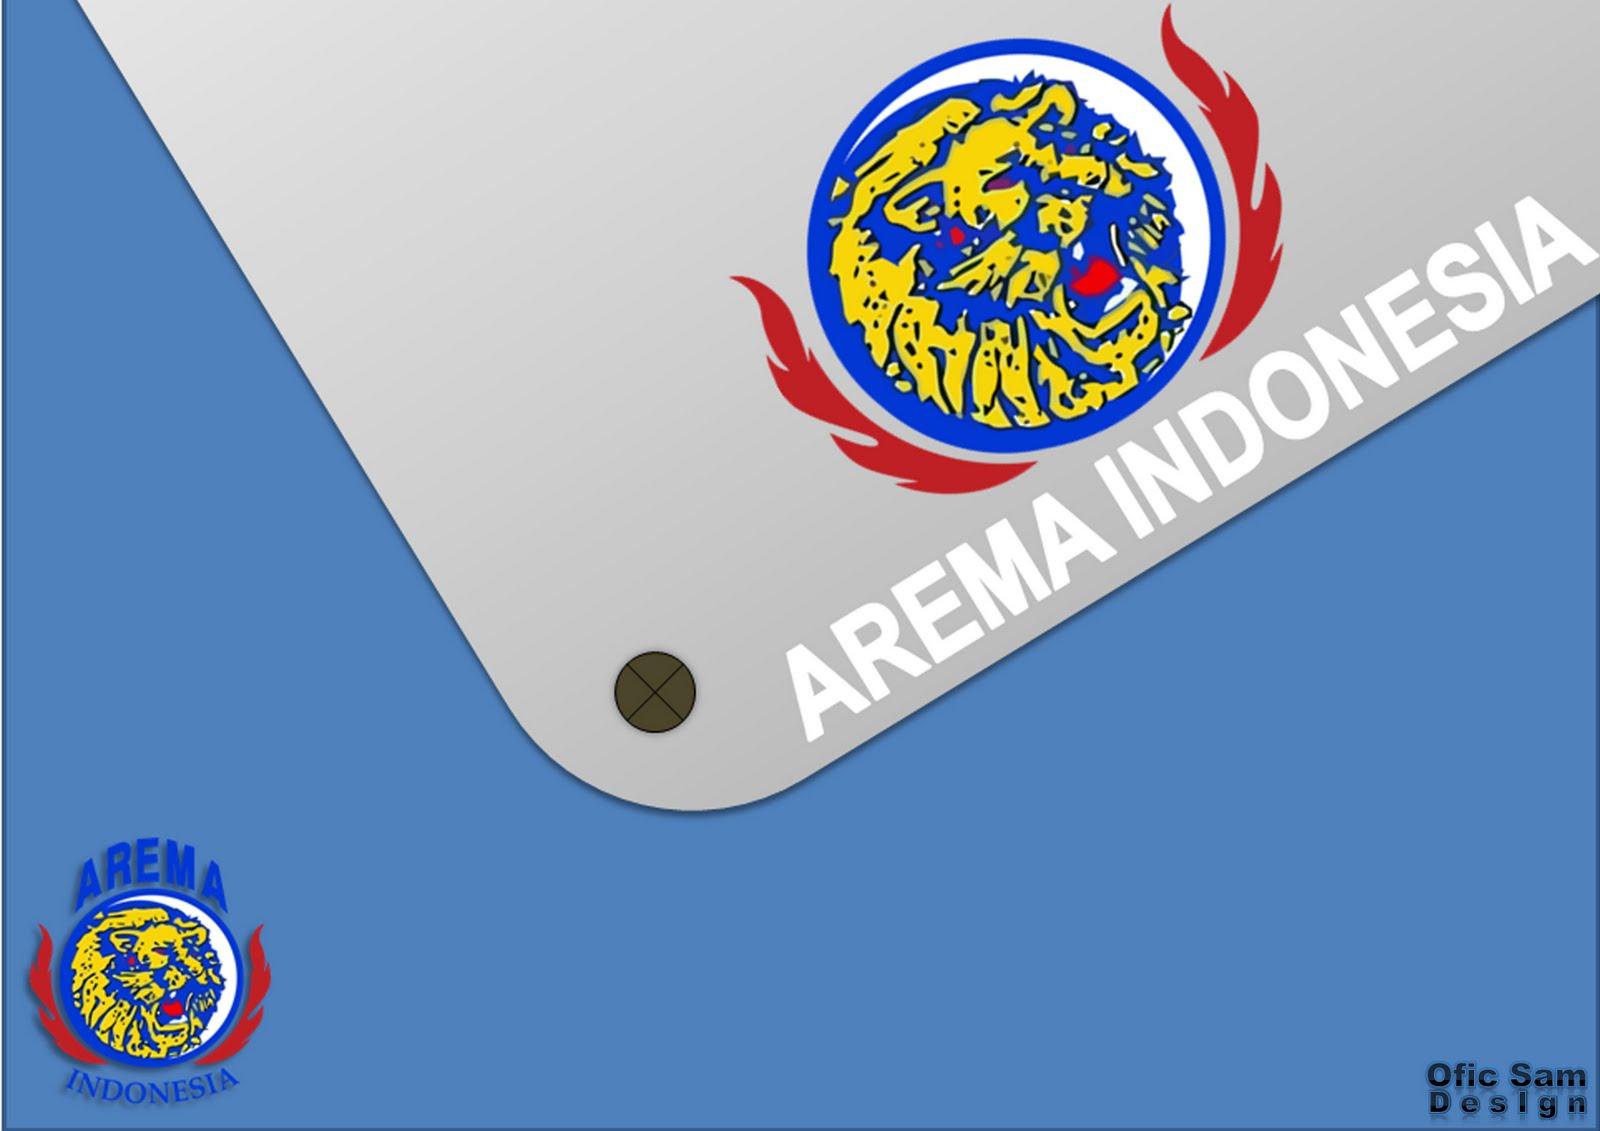 http://4.bp.blogspot.com/-Atylf1m7LUE/Tb-IbICZ5JI/AAAAAAAAAJQ/R230JwJv7as/s1600/wallpaper+arema+indonesia+mei+2011+by+ofic+sam+_boy_gassipers@yahoo.co.id+%281%29.jpg